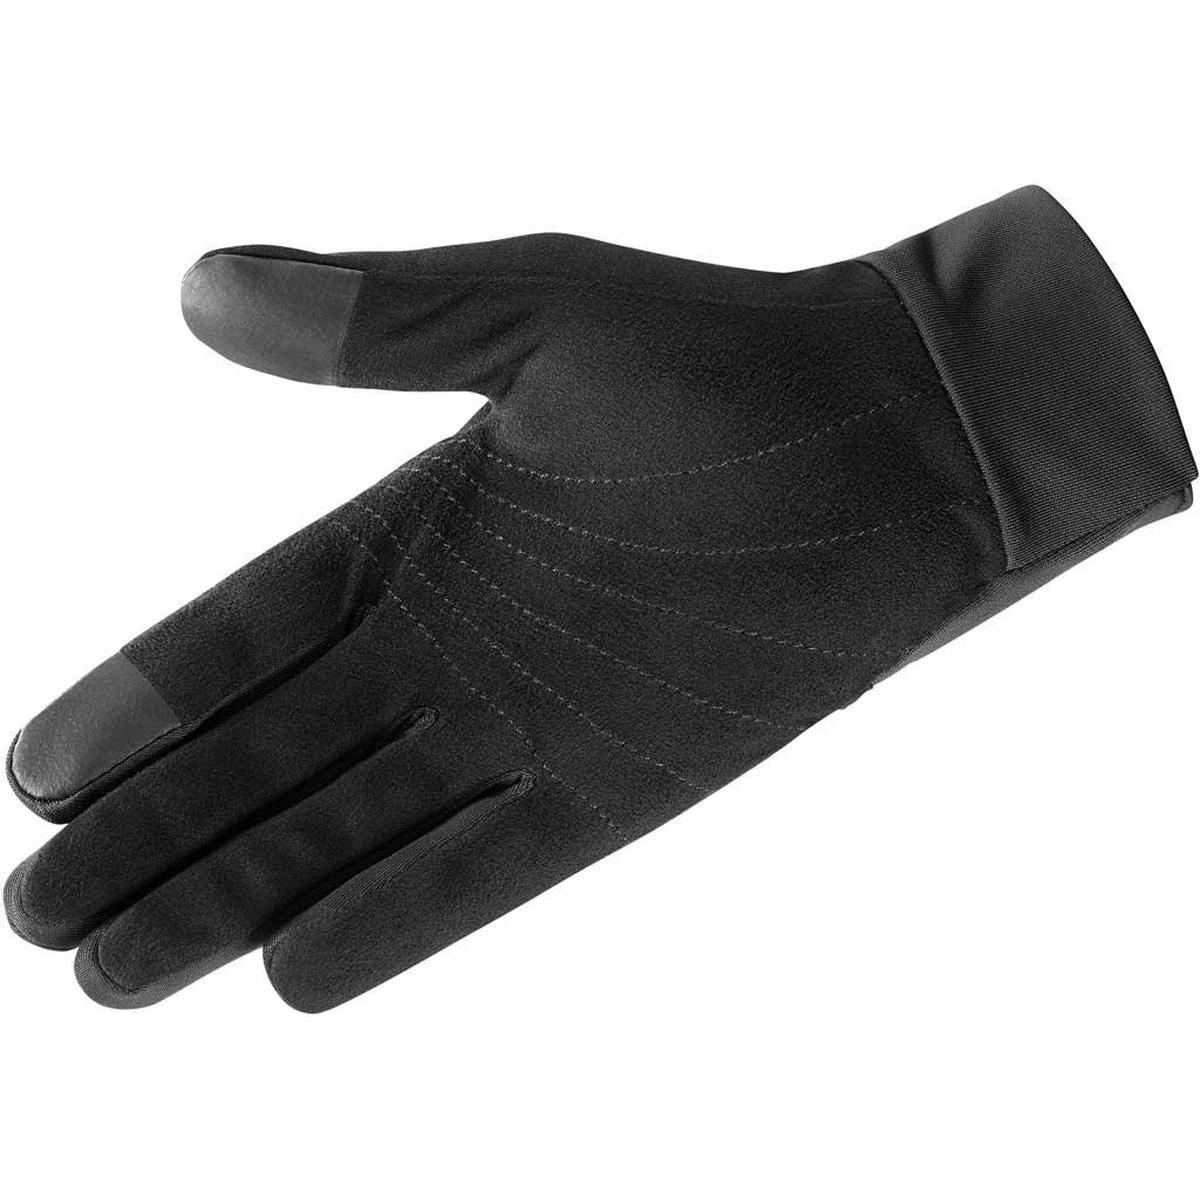 Salomon Gloves Fast Wing Winter Black